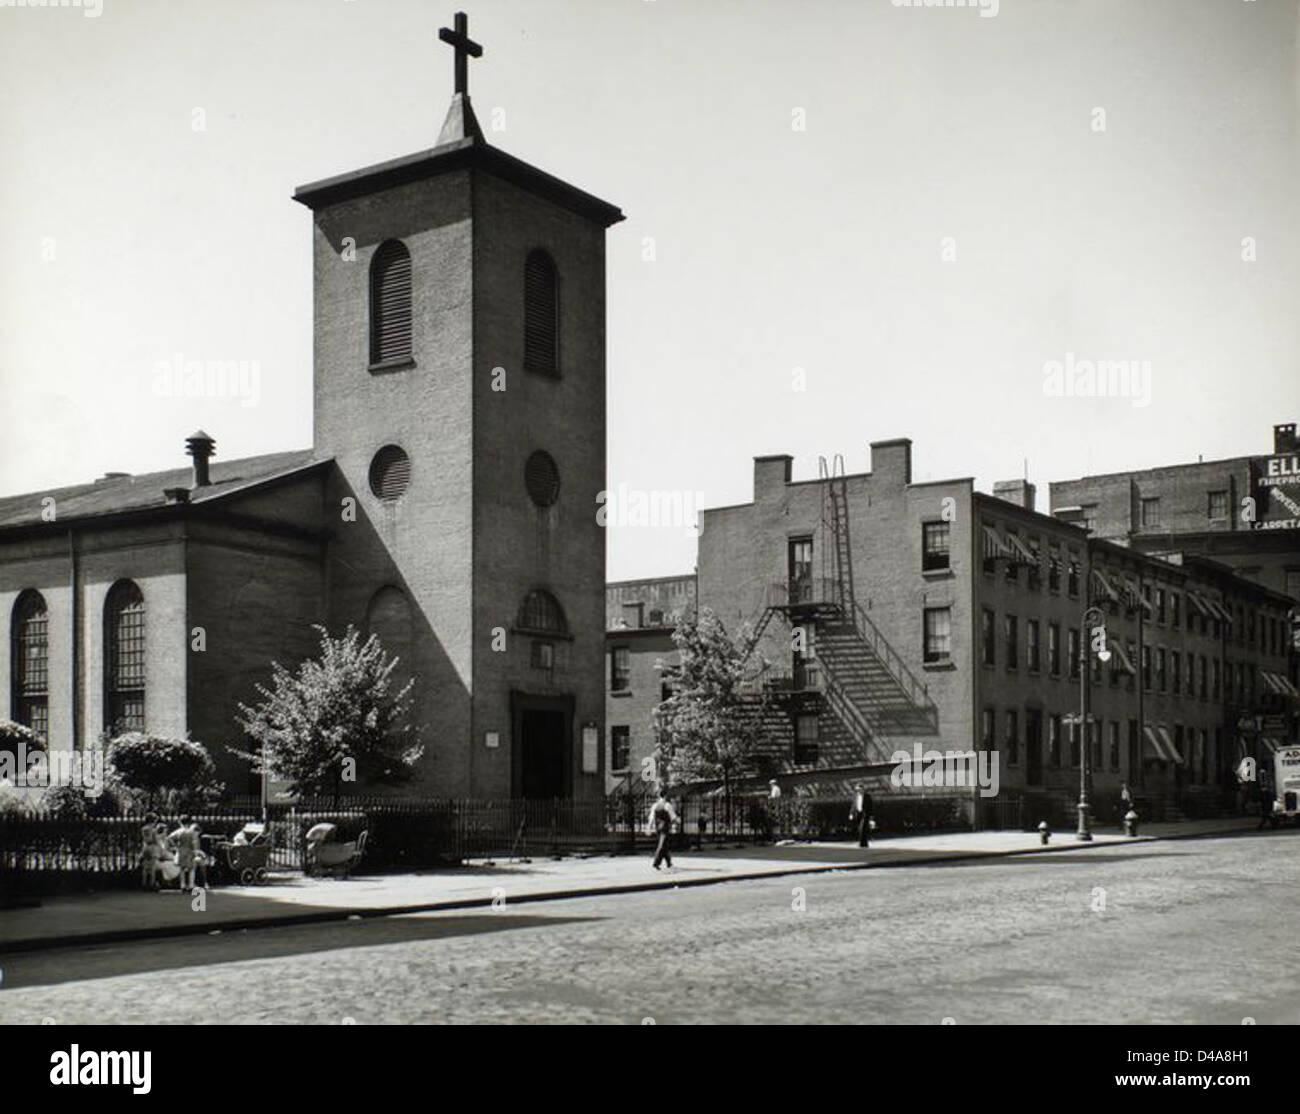 St. Luke's Chapel and Old Houses, Hudson, corner of Grove, M... Stock Photo